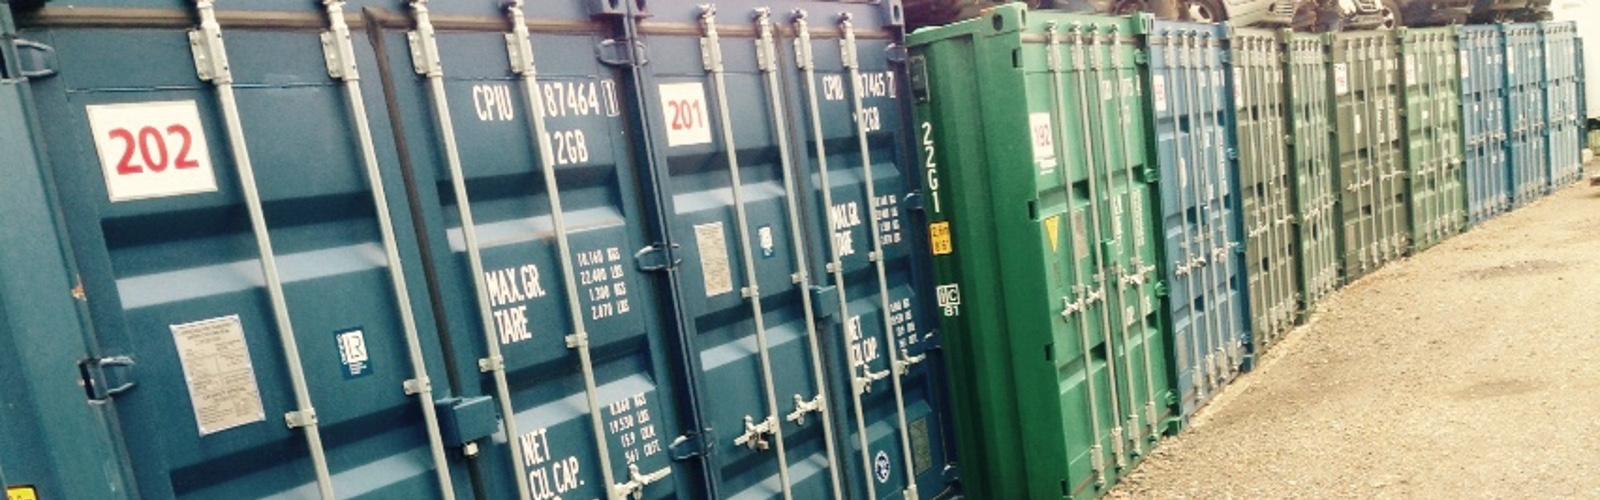 Boat Storage In Leicester Gilmorton Storage